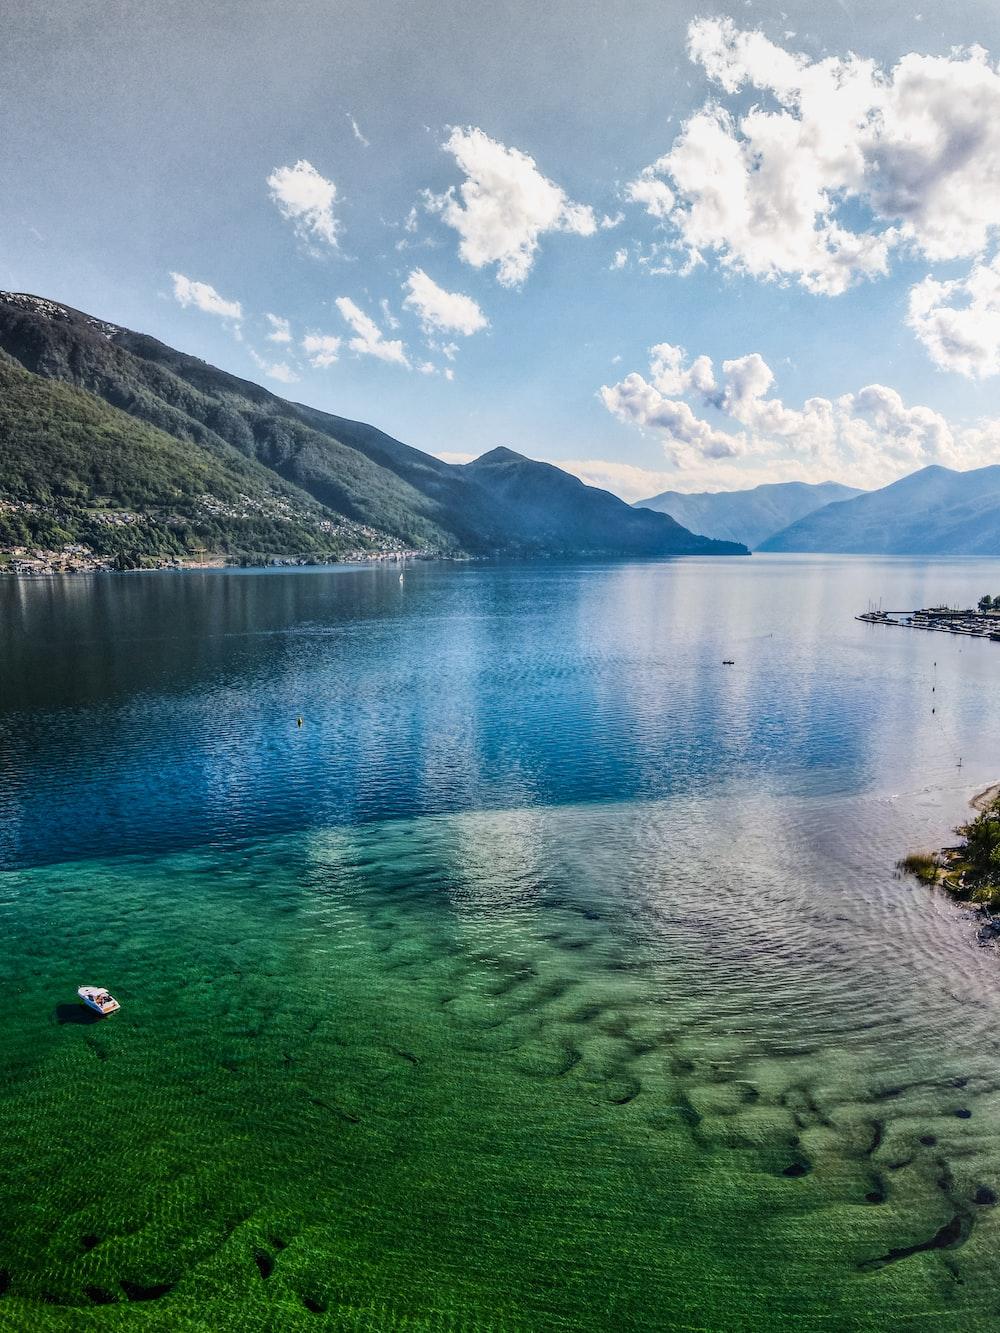 green lake near green mountain under blue sky during daytime